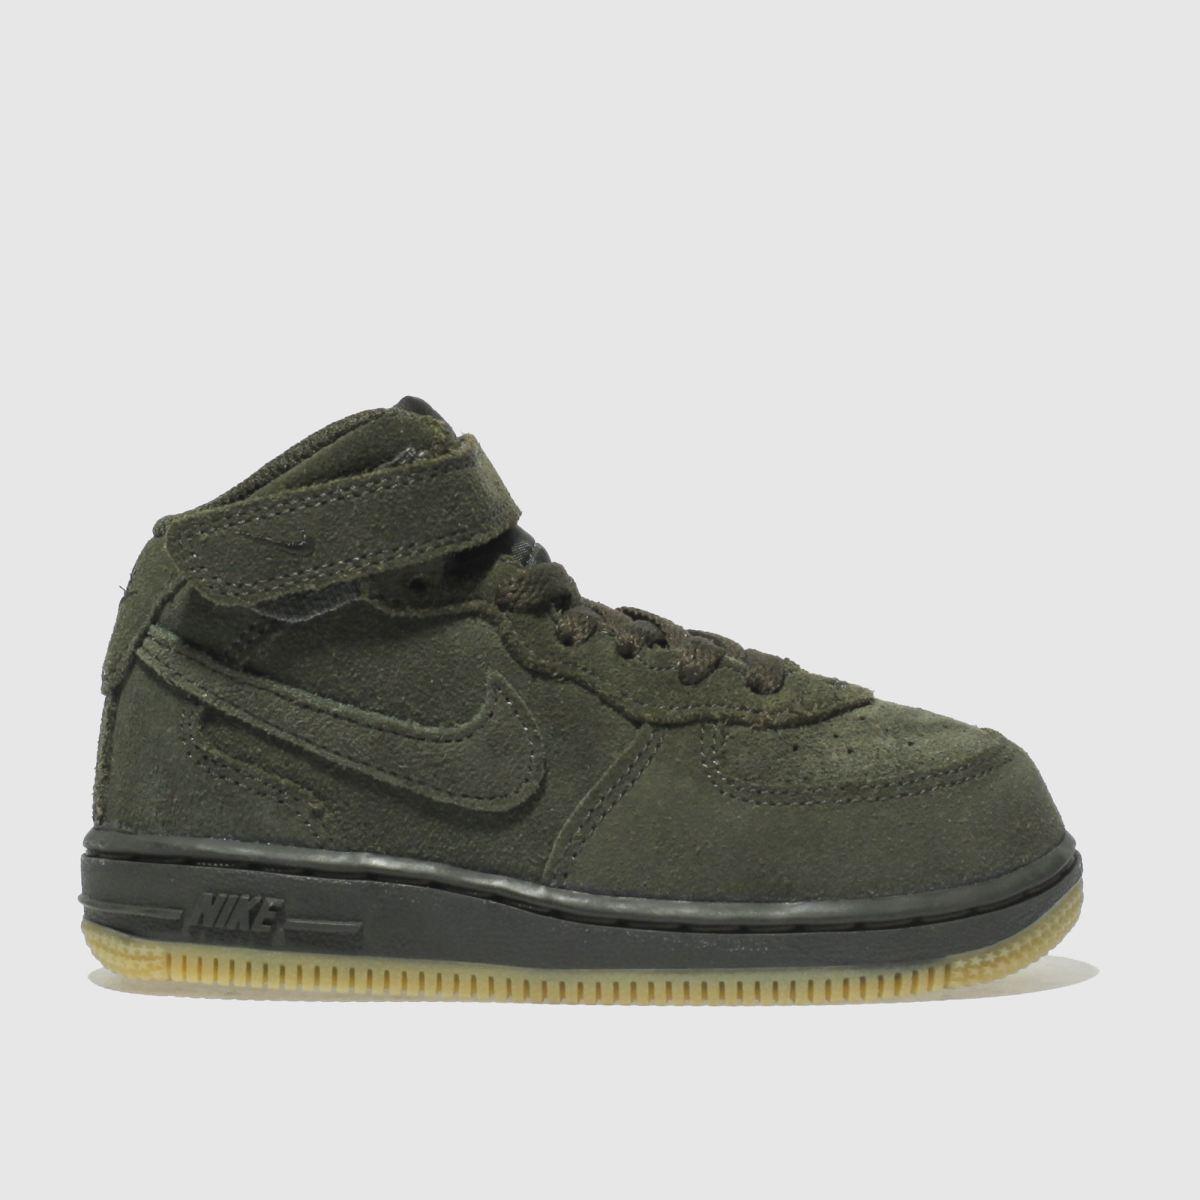 Nike Khaki Air Force 1 High Lv8 Trainers Toddler